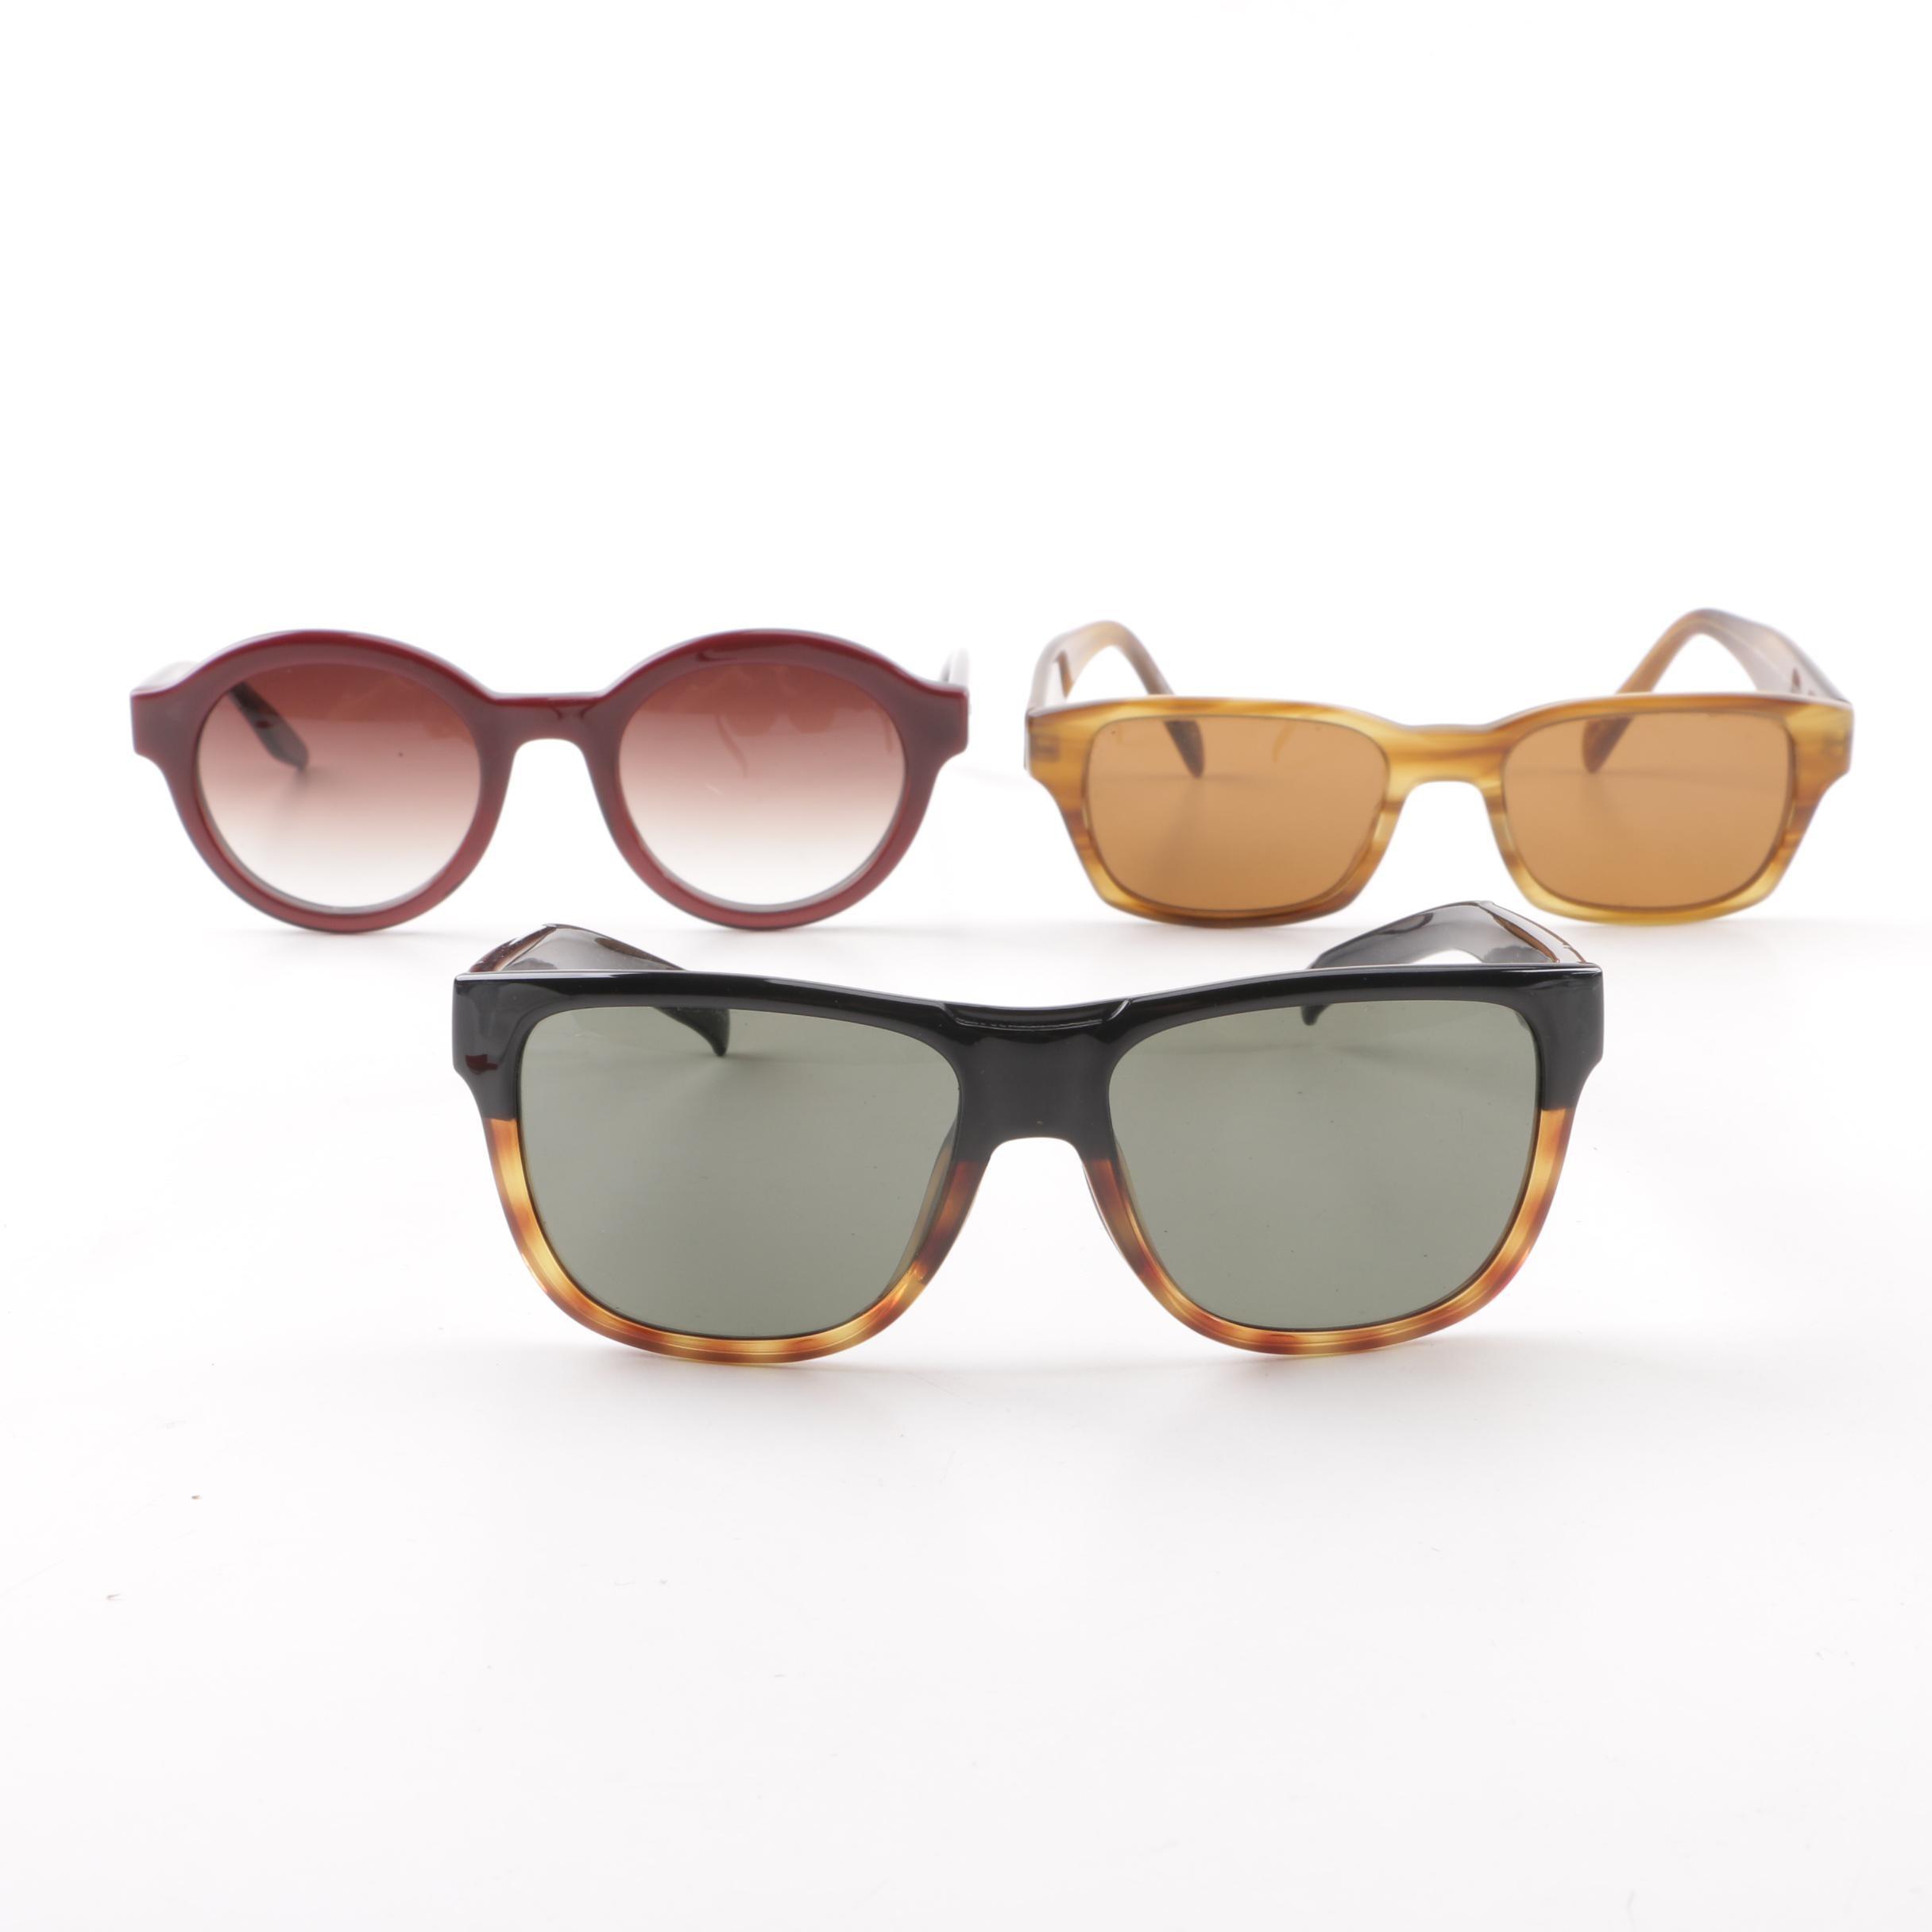 Paul Smith, Smith Optics and Barton Perreira Sunglasses